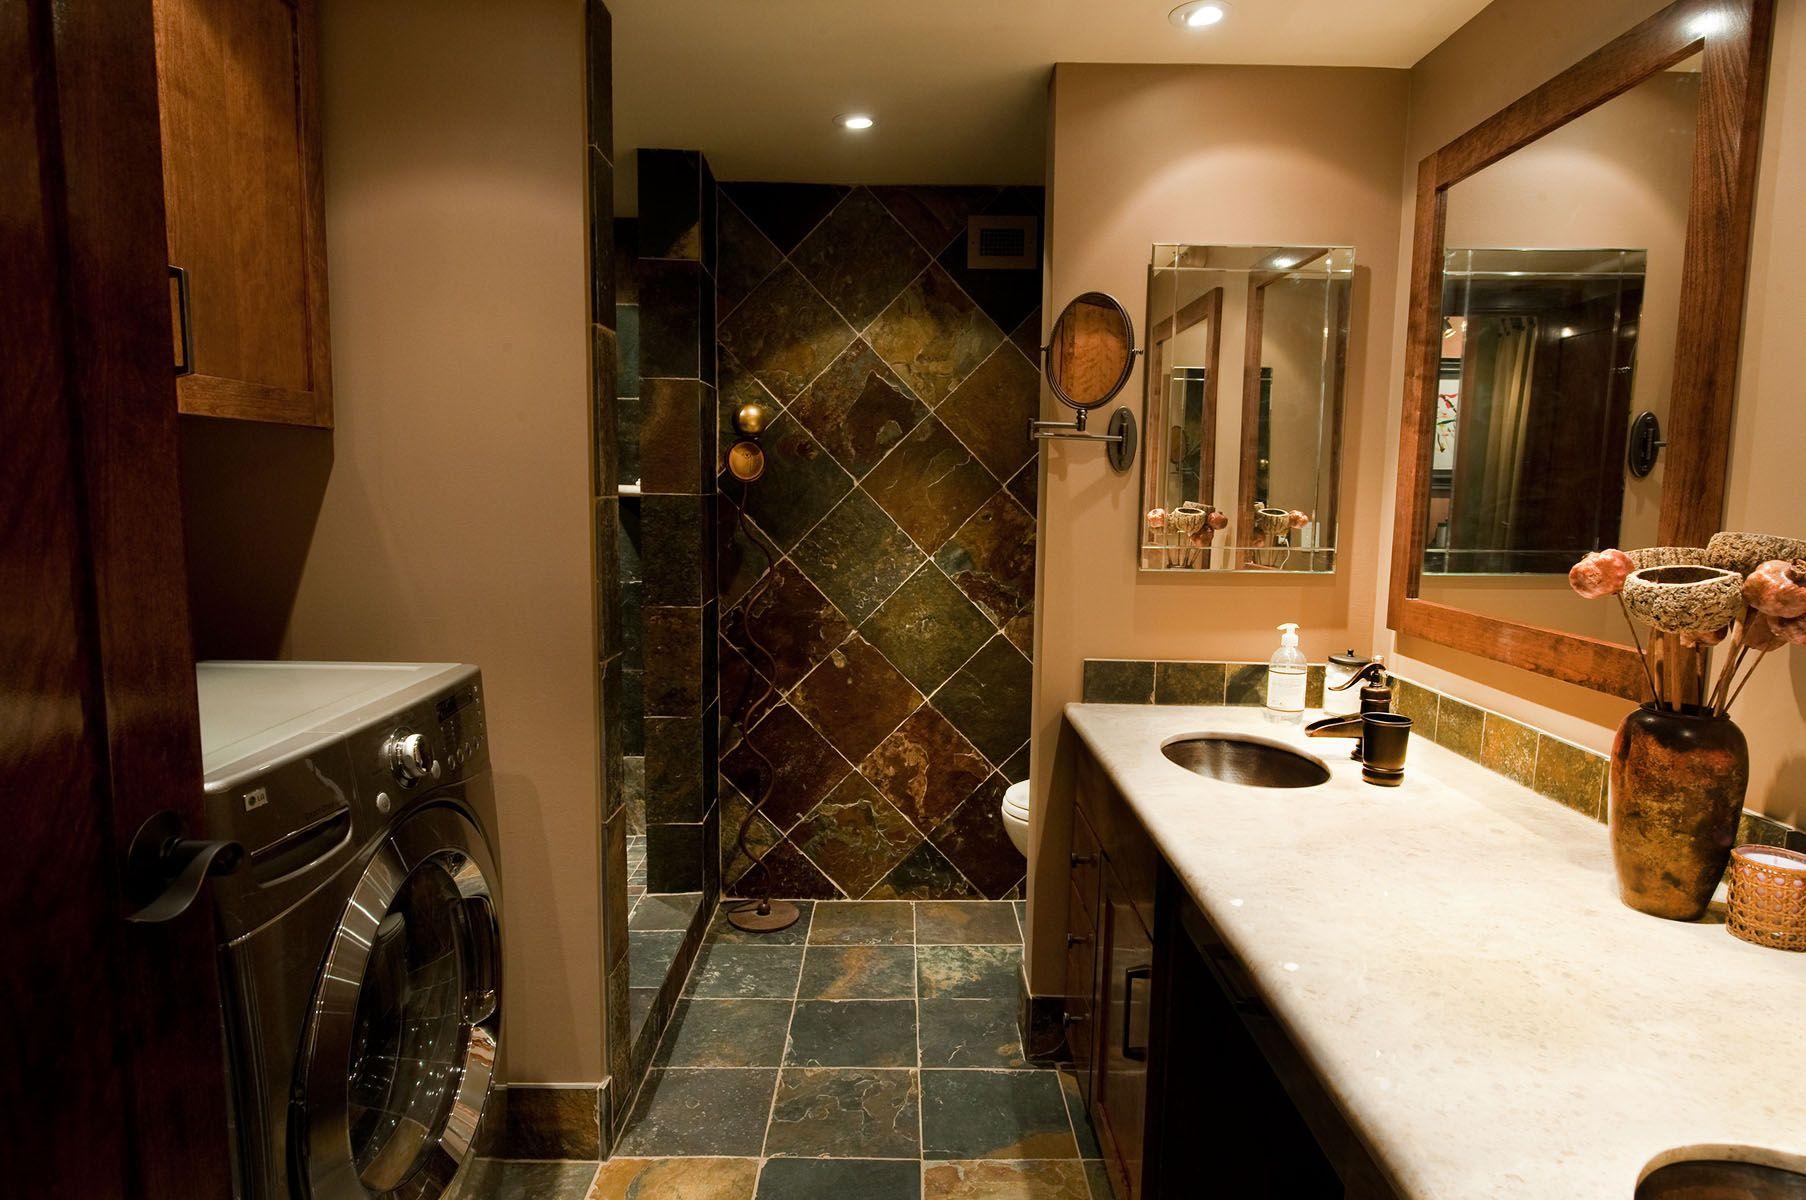 17 Images About Bathroom On Pinterest Slate Bathroom Tiles For Bathrooms And Slate Shower 17